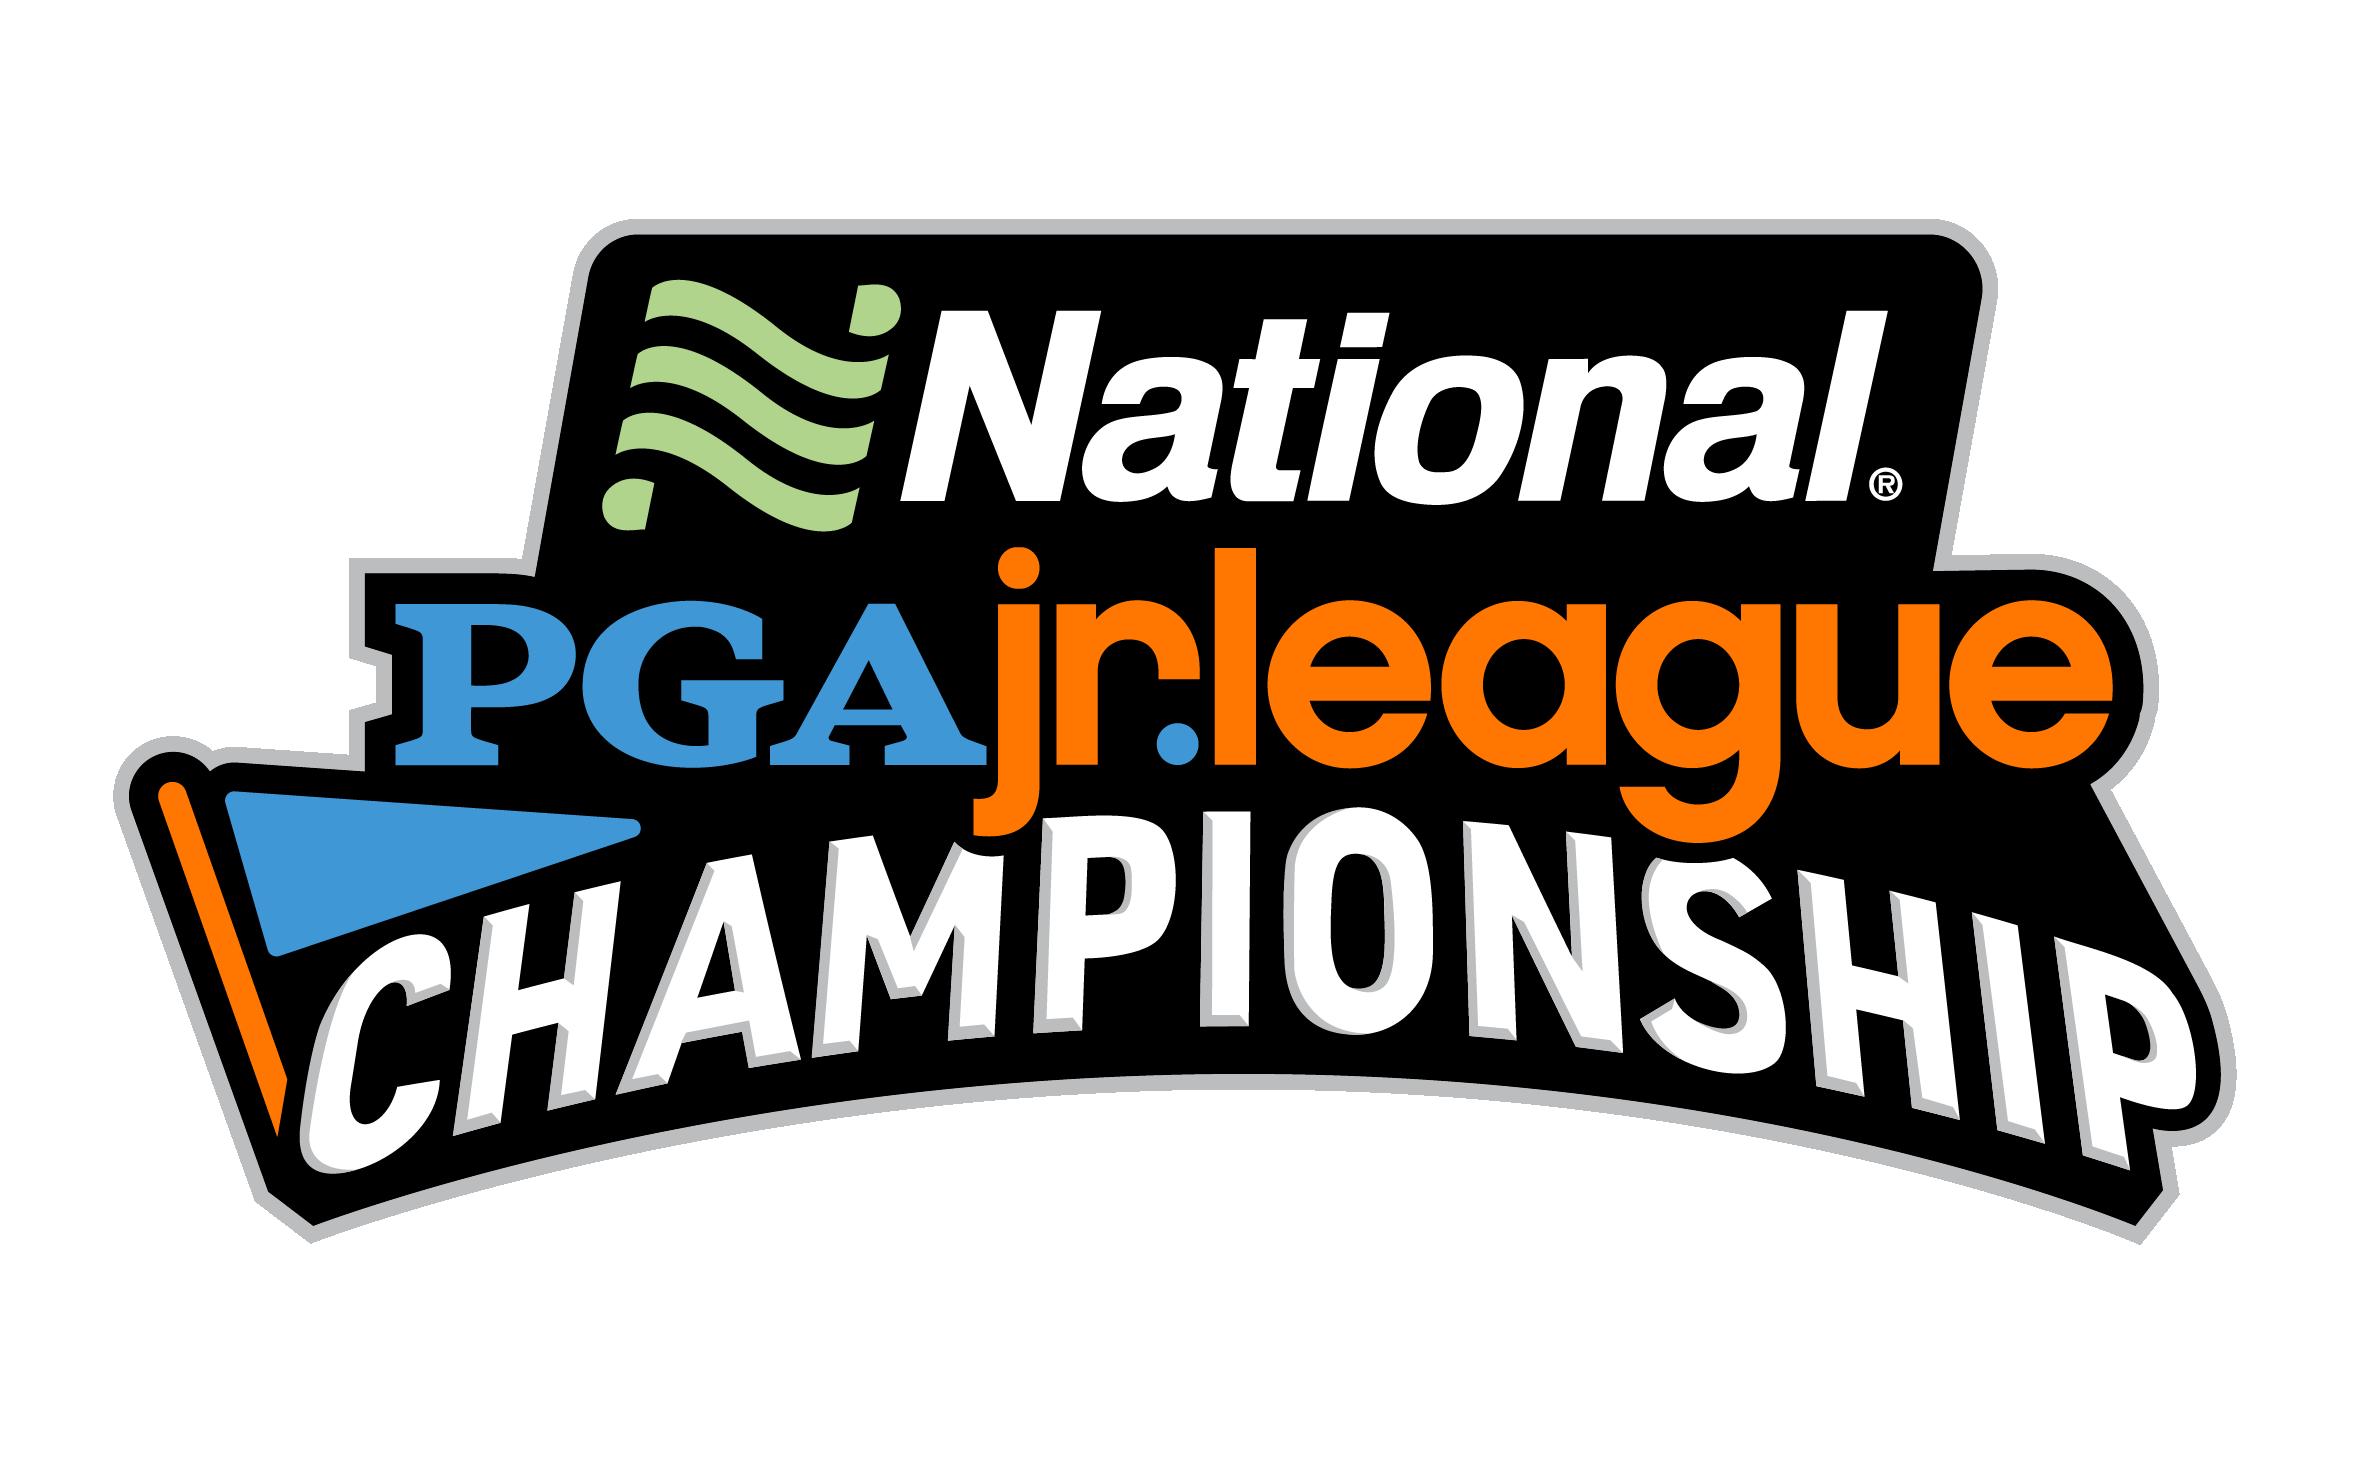 National Car Rental PGA Jr. League Championship